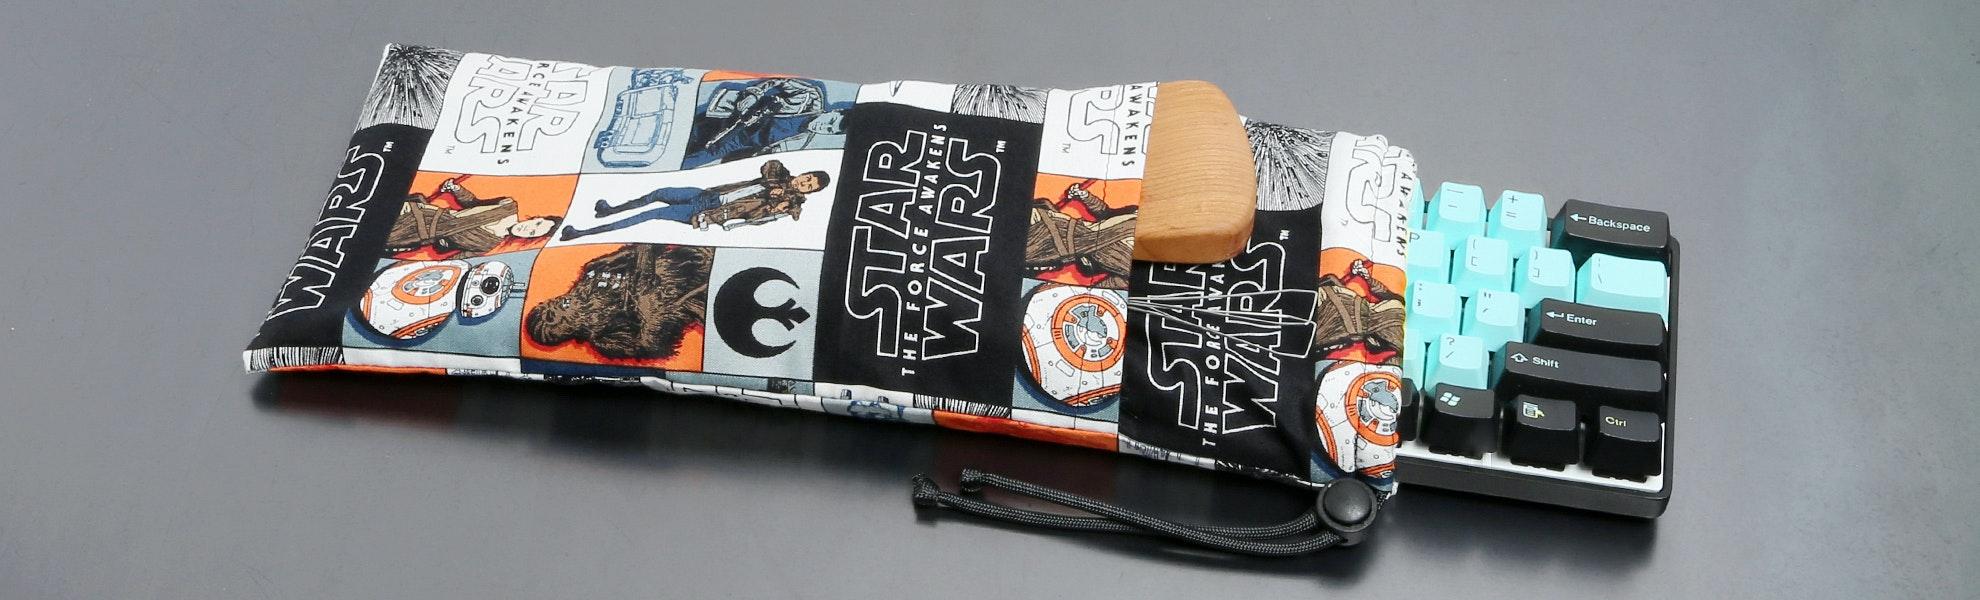 Star Wars Keyboard Soft Cases